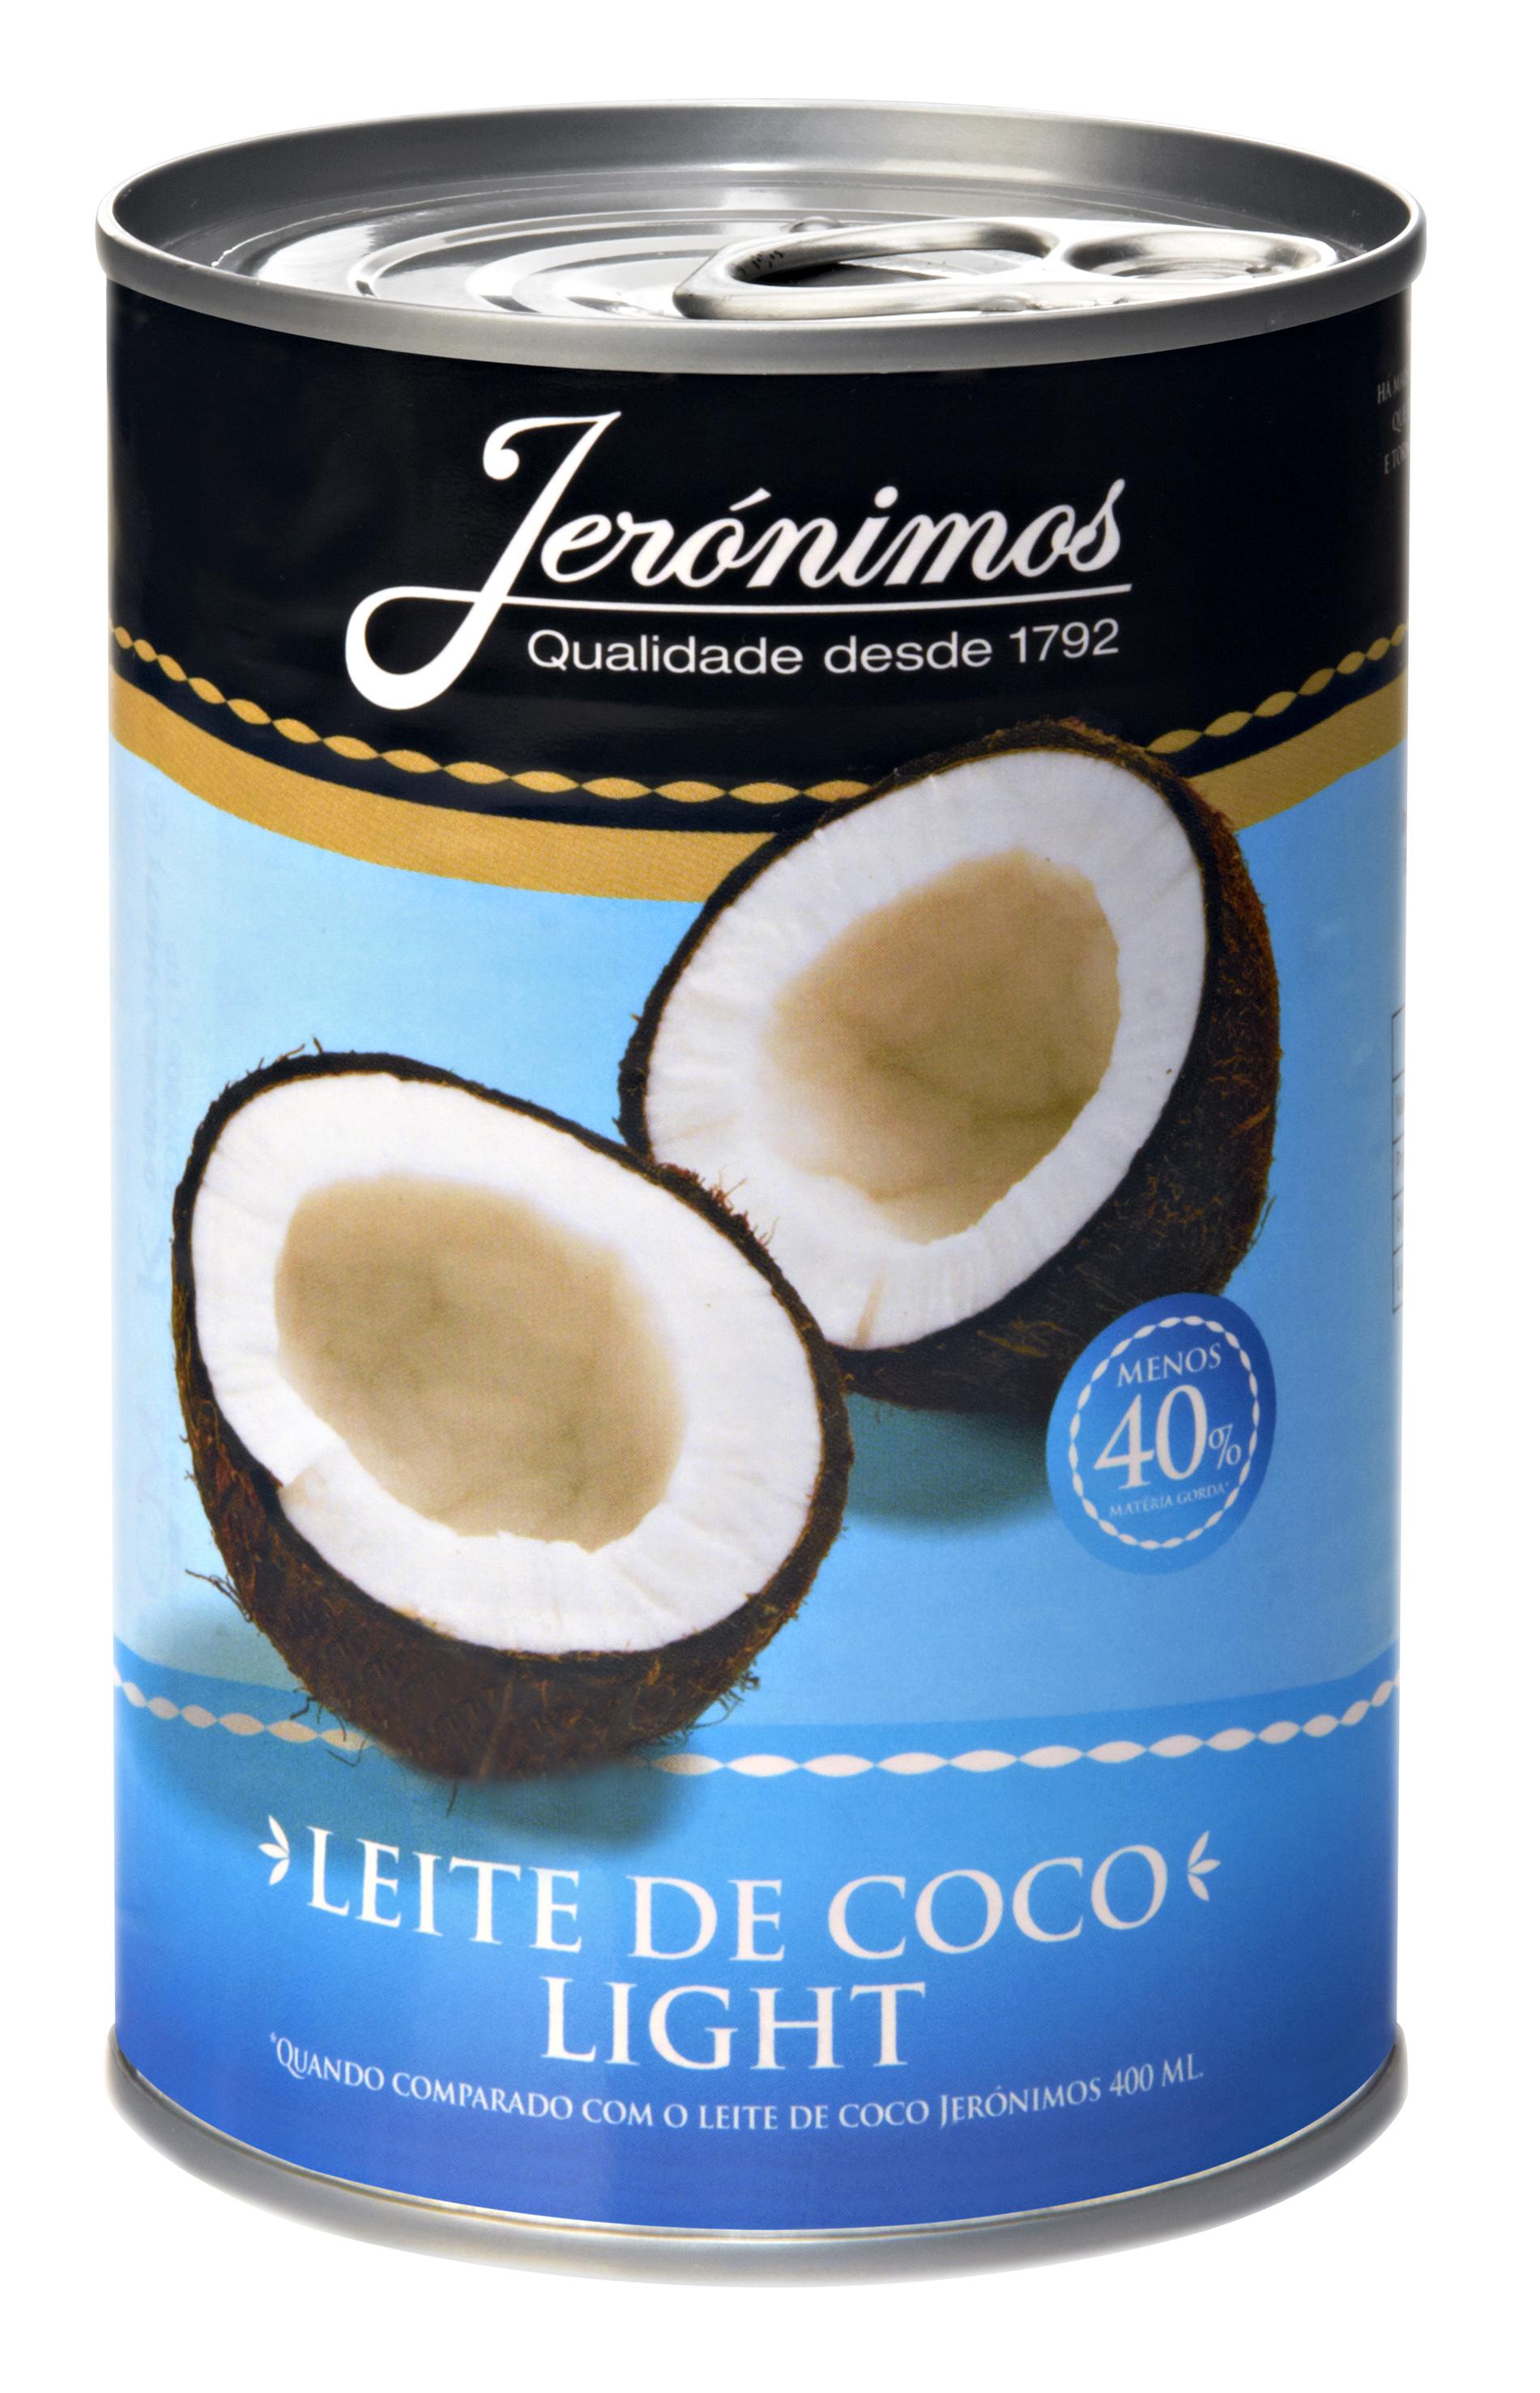 Jeronimos Leite de Coco Light 400ml